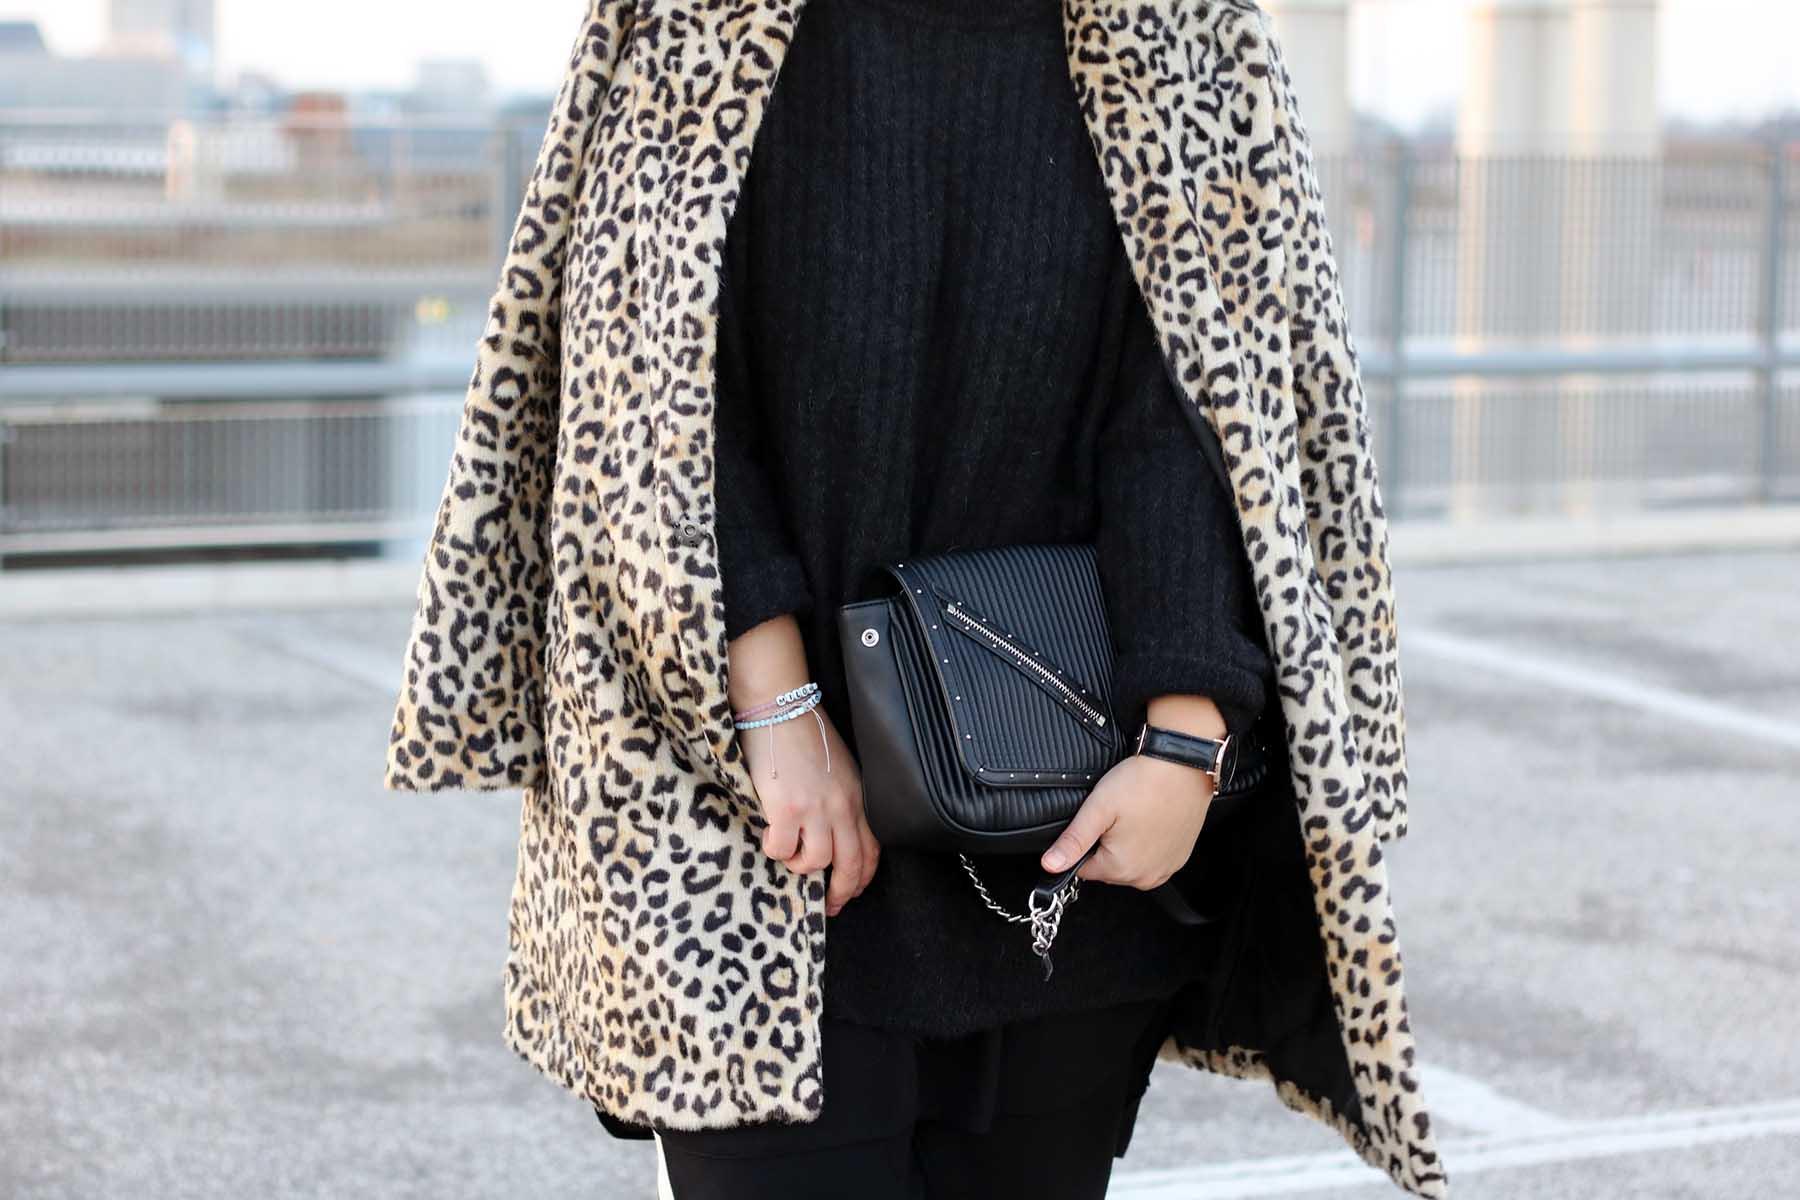 outift-leomantel-mantel-winter-leoparden-modeblog-fashionblog-look-braunschweig16